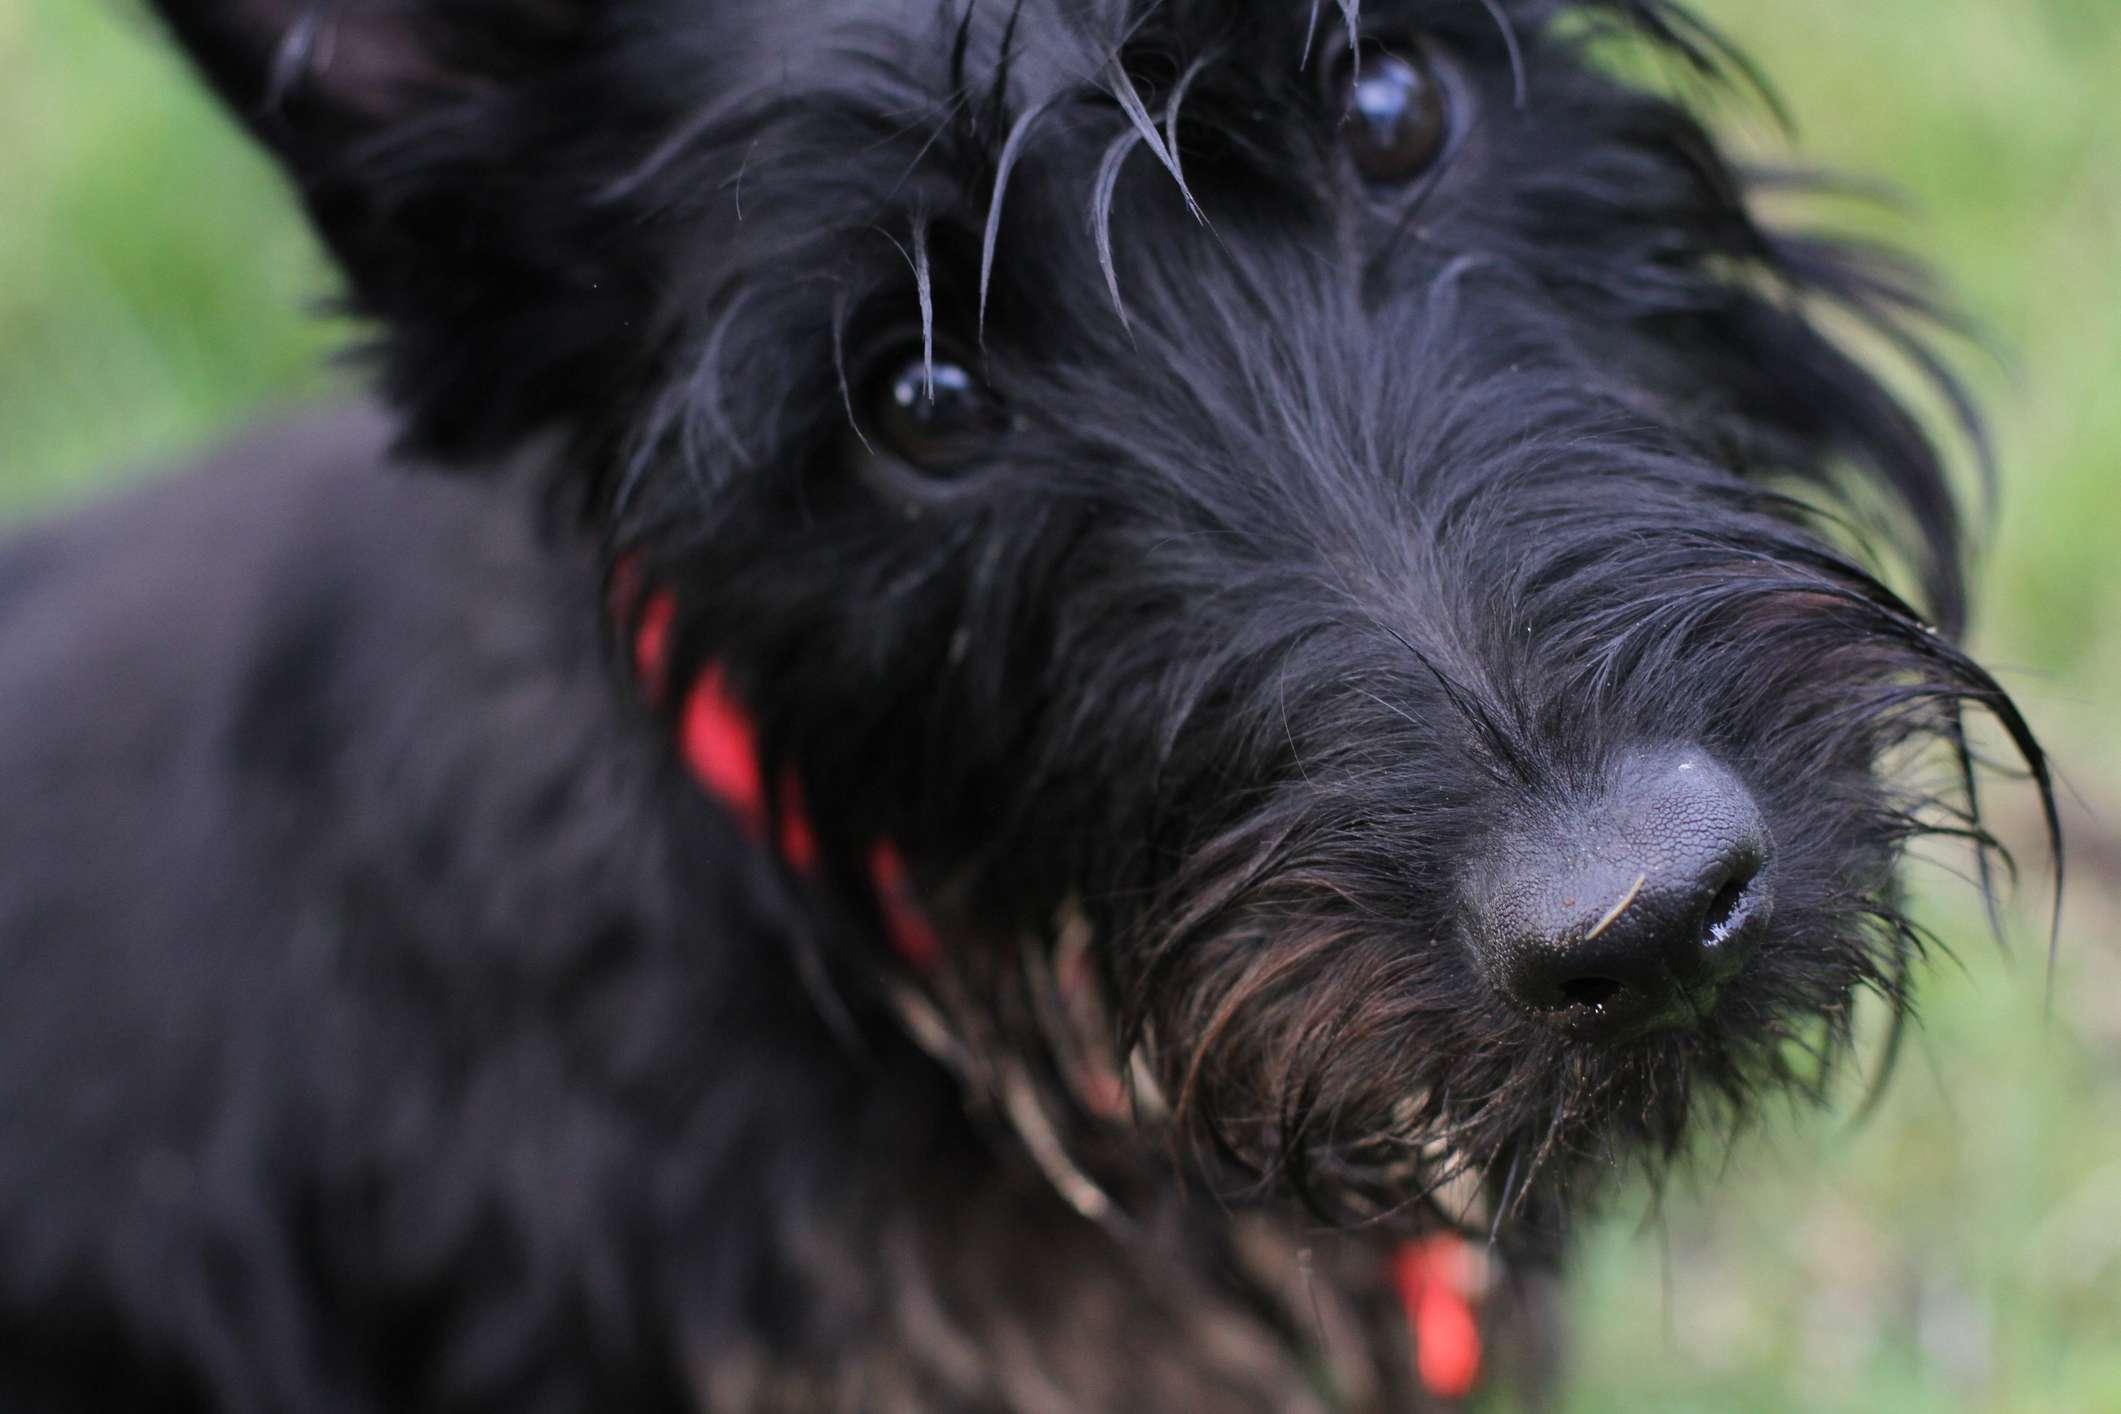 Up close portrait of Scottish terrier